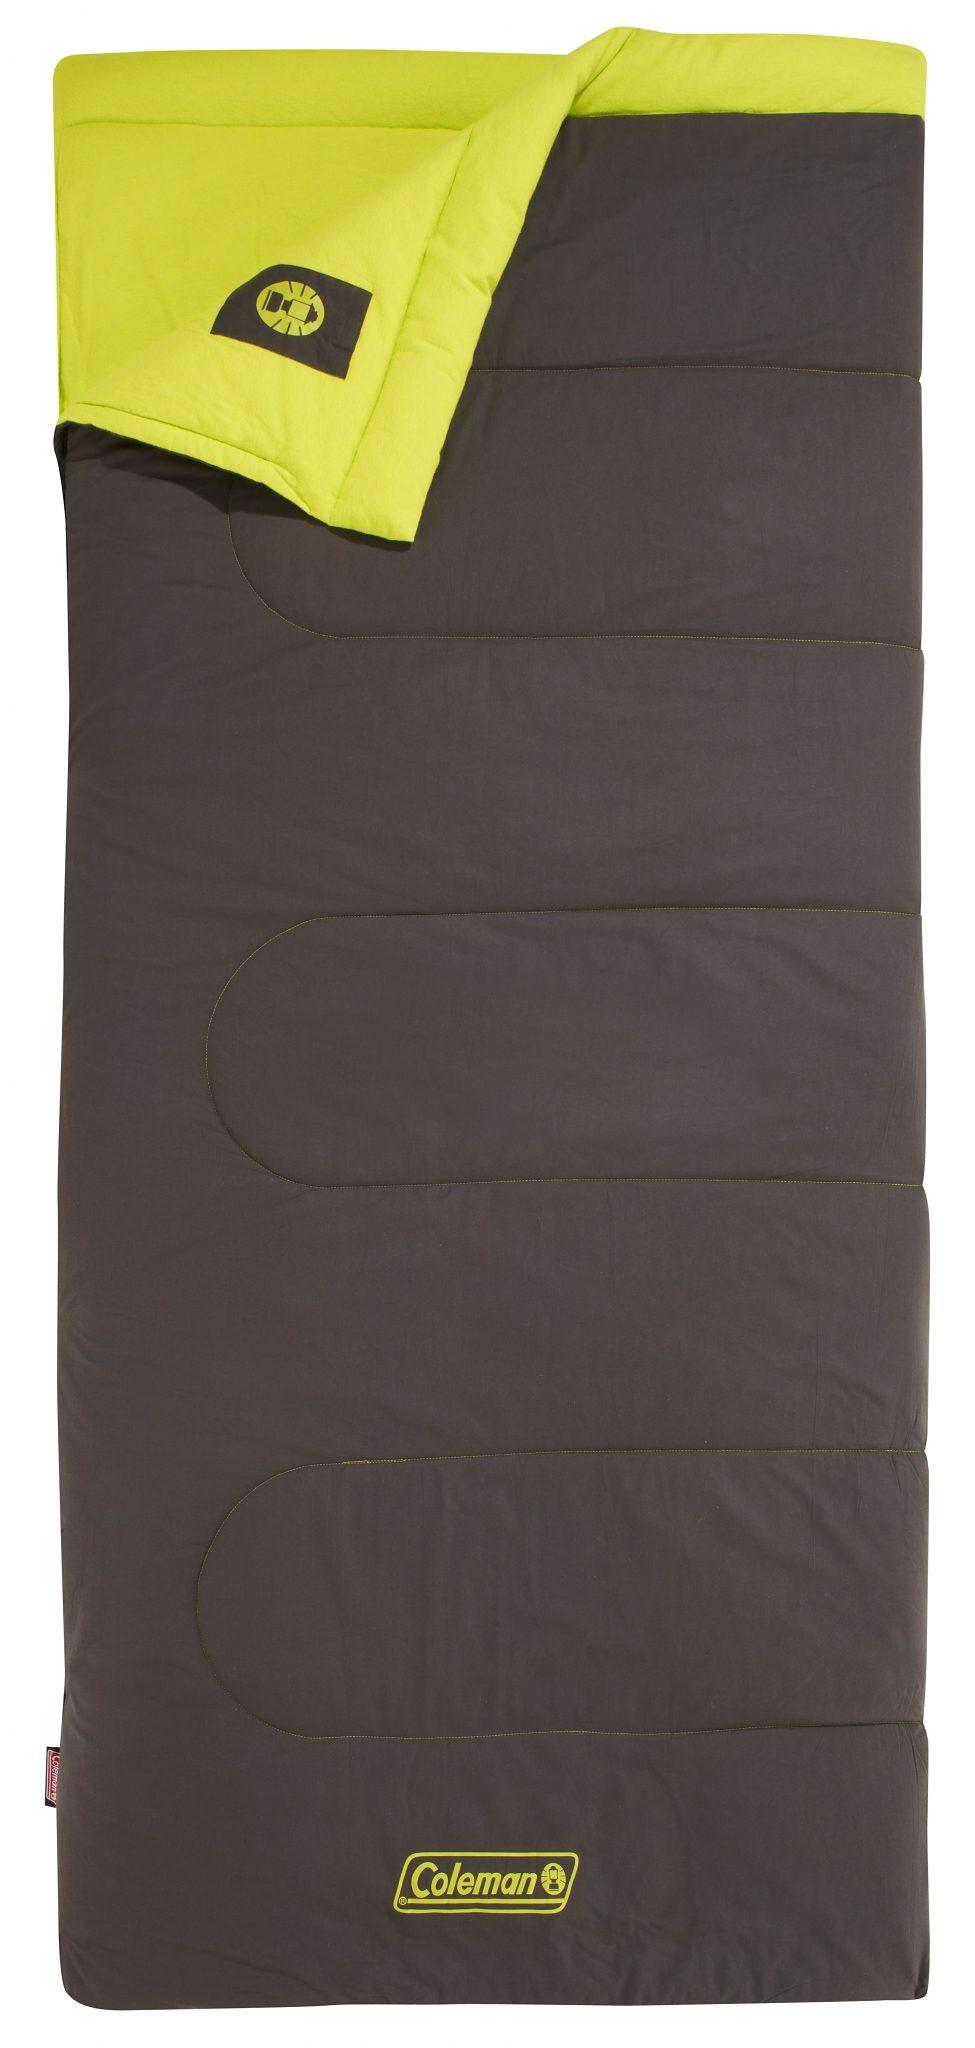 COLEMAN Schlafsack »Heaton Peak Comfort 220 Schlafsack«